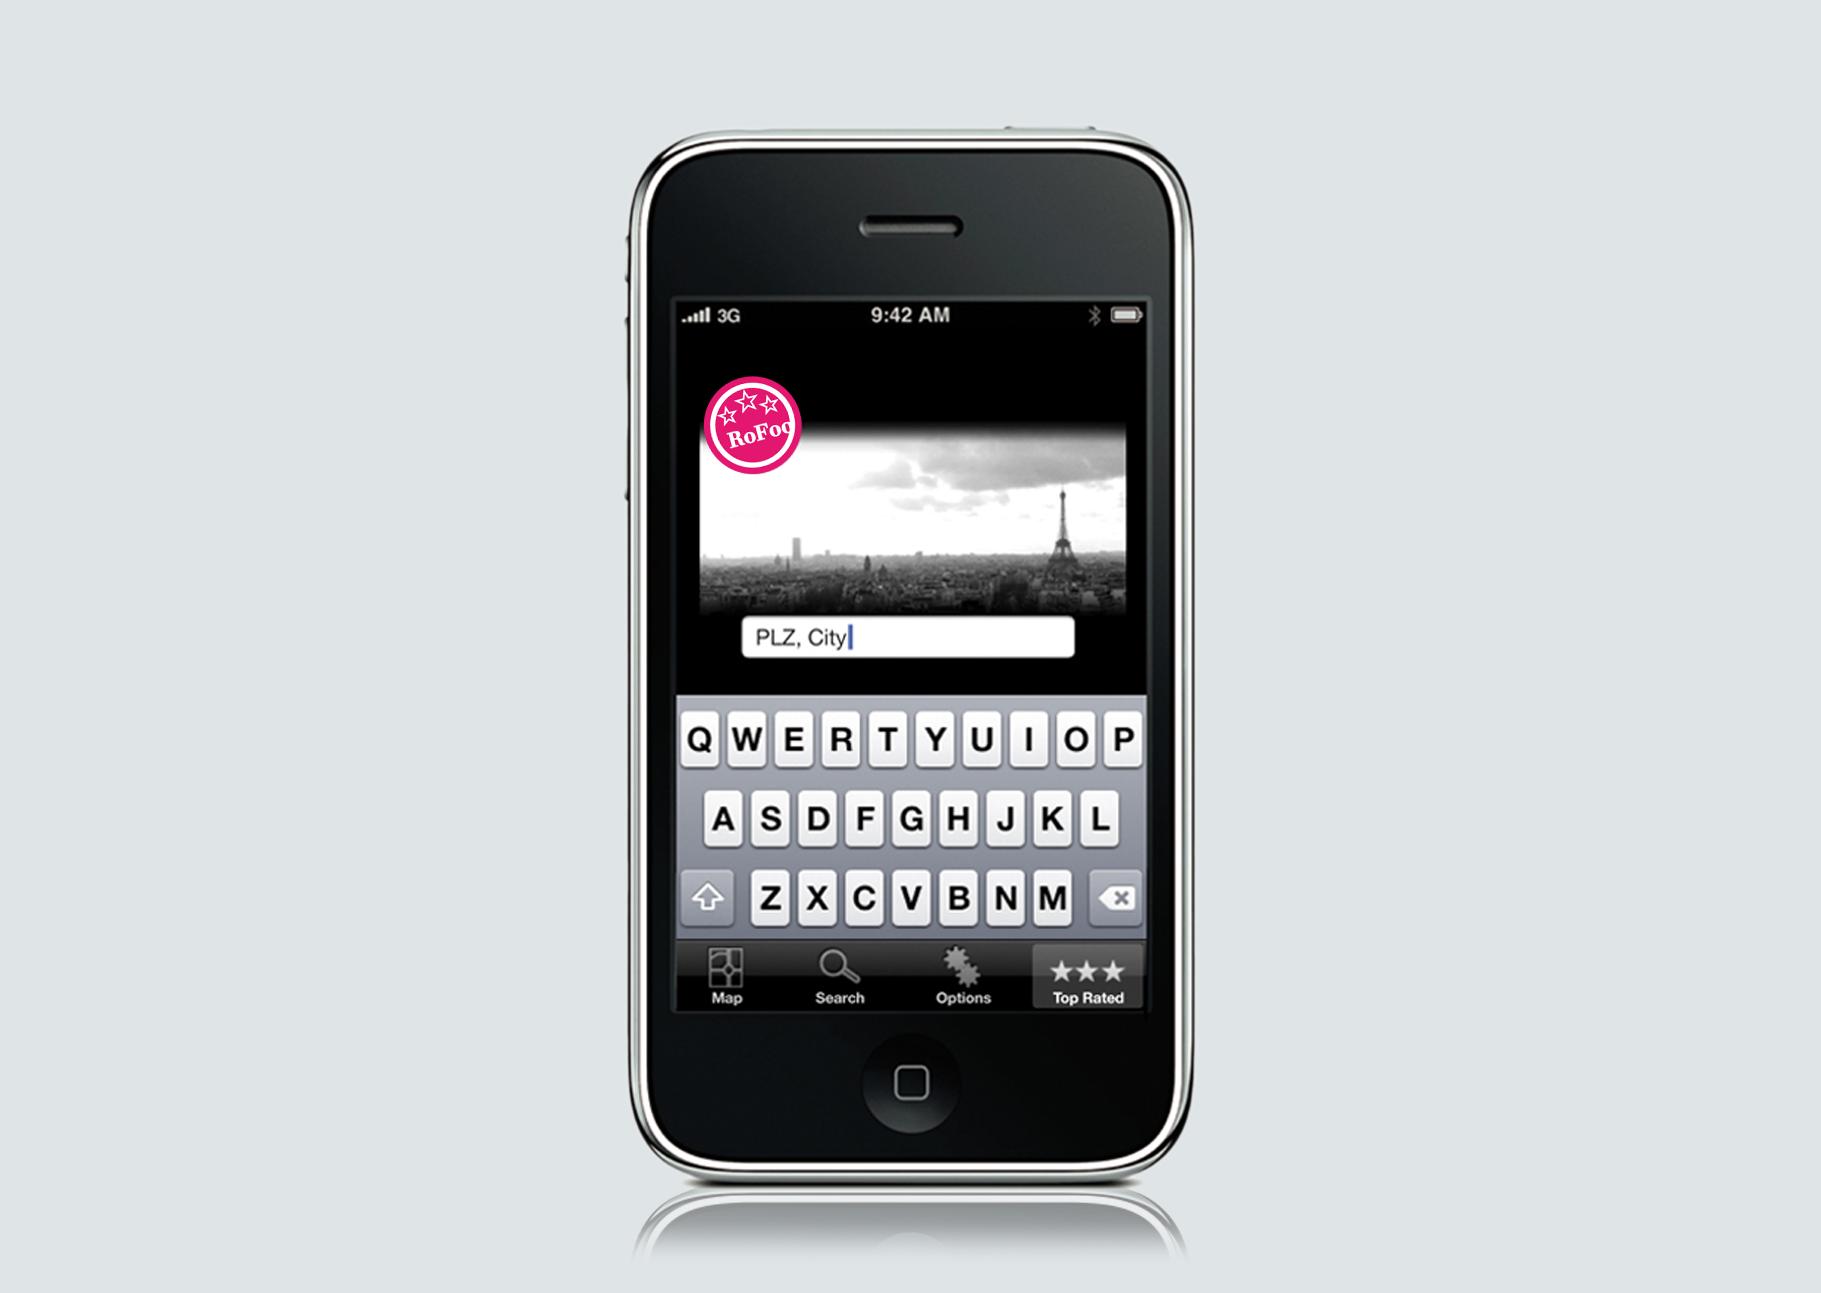 RoFoo - Romantic Food Finder App UX Mockup